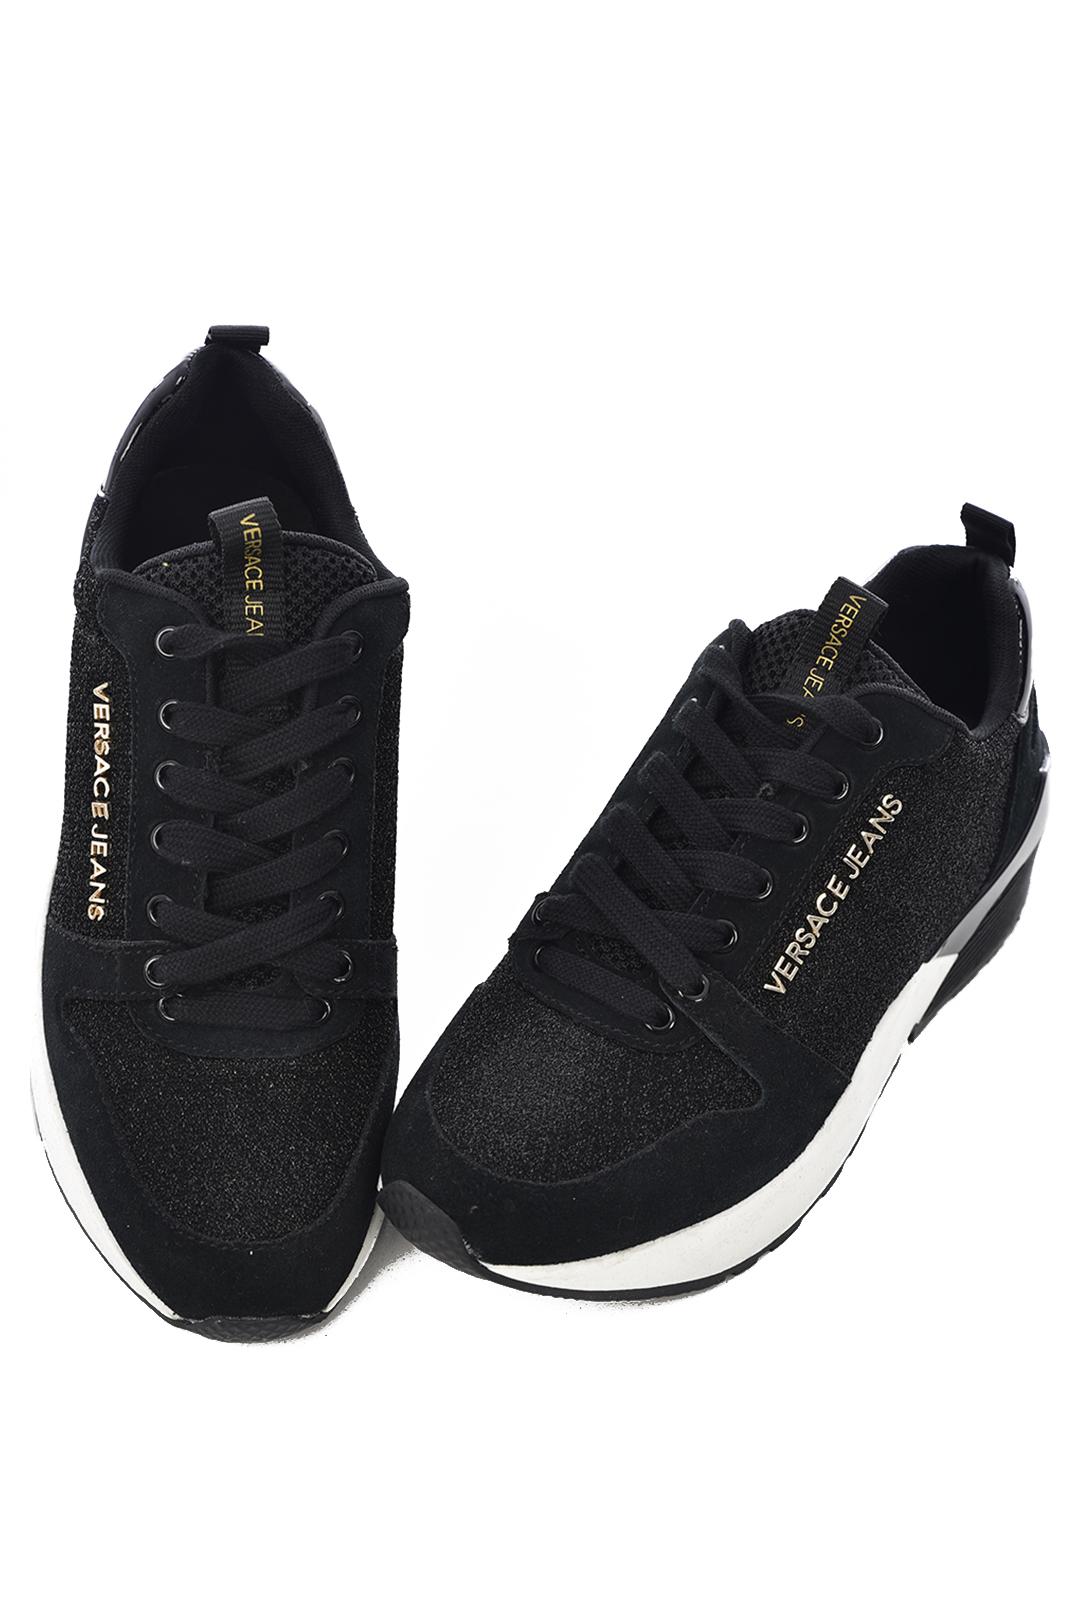 Baskets / Sneakers  Versace Jeans VSBSL1  70835 899 black